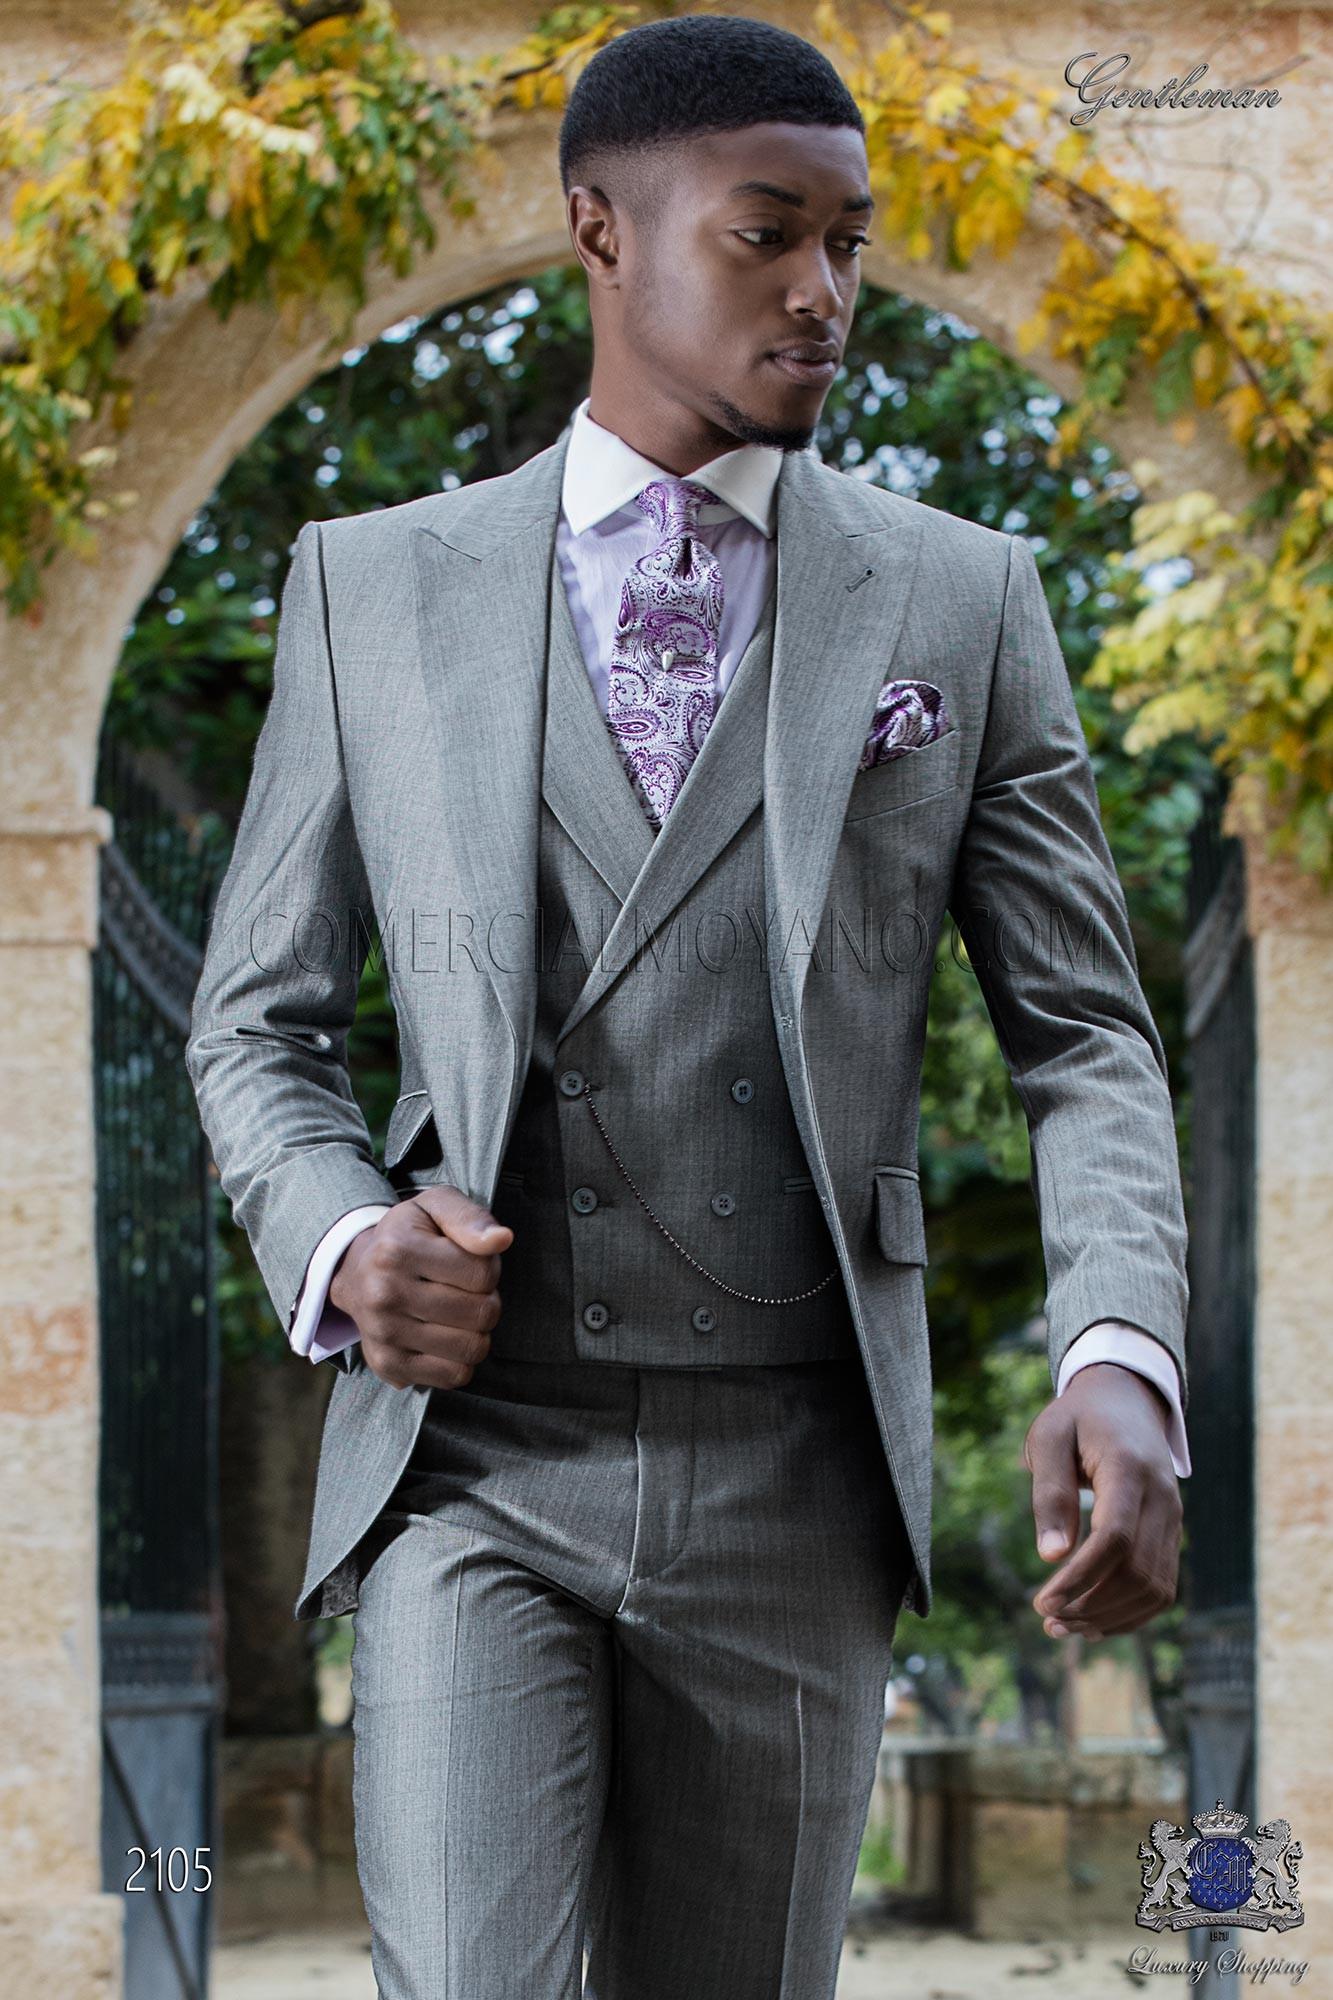 NEW Ottavio Nuccio Gala 2018 italian Wedding Suits Collection ...